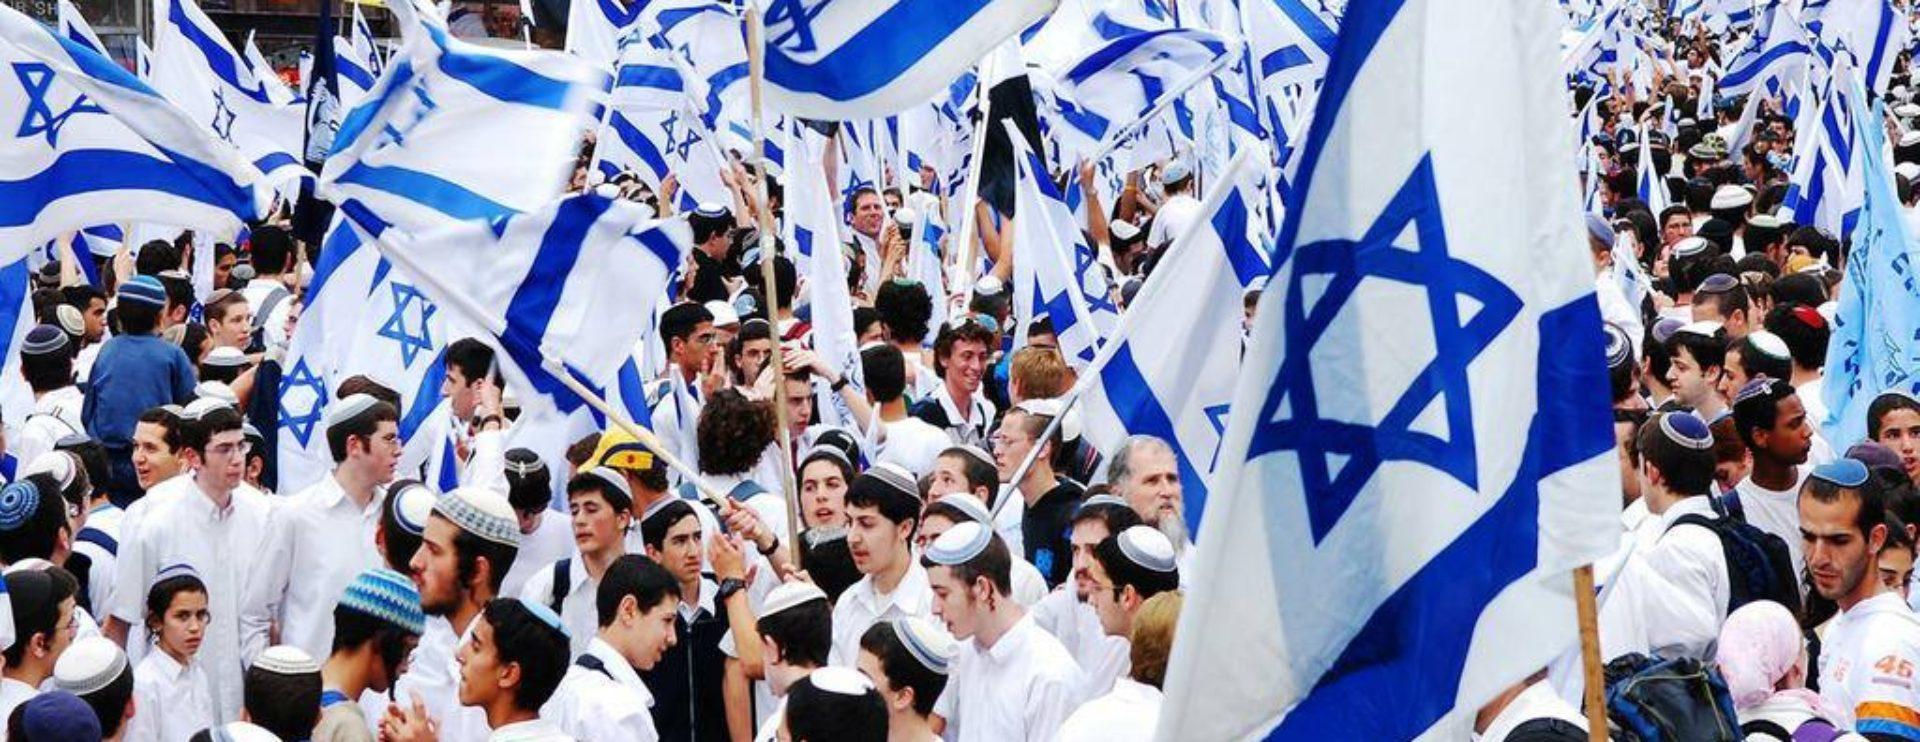 Worldwide Coalition for Israel Foundation